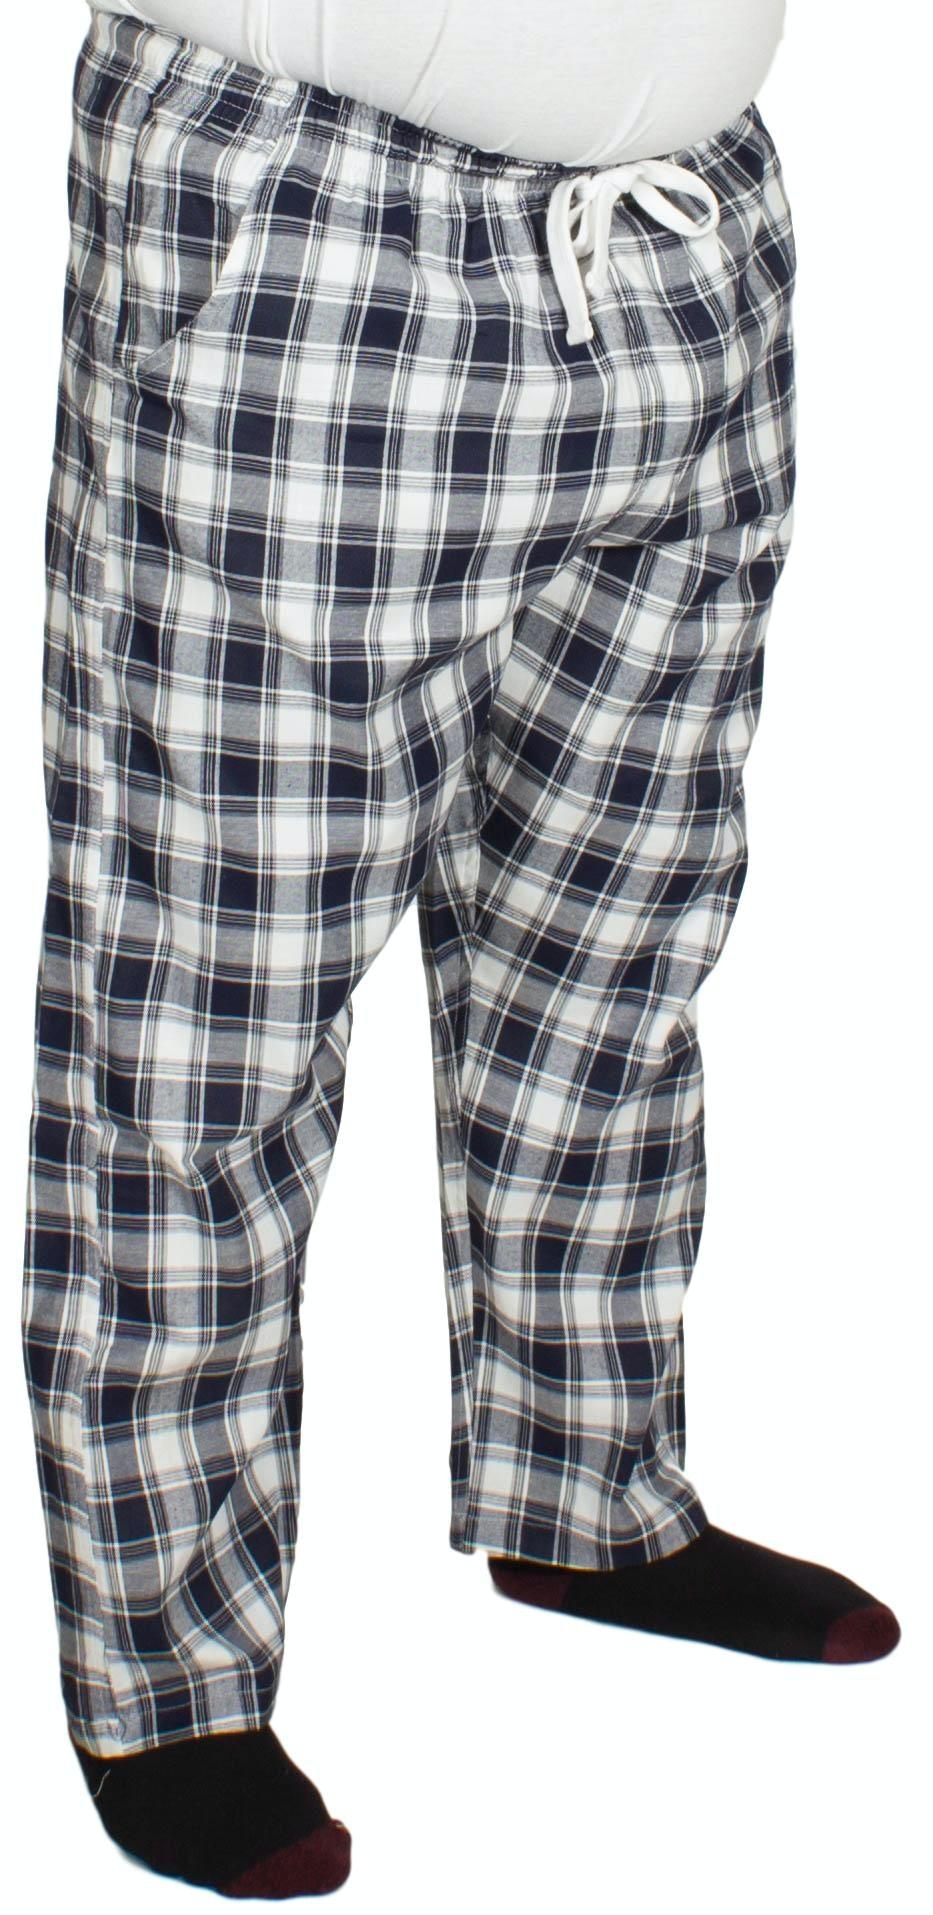 Bigdude Check Lounge Pants Navy/White